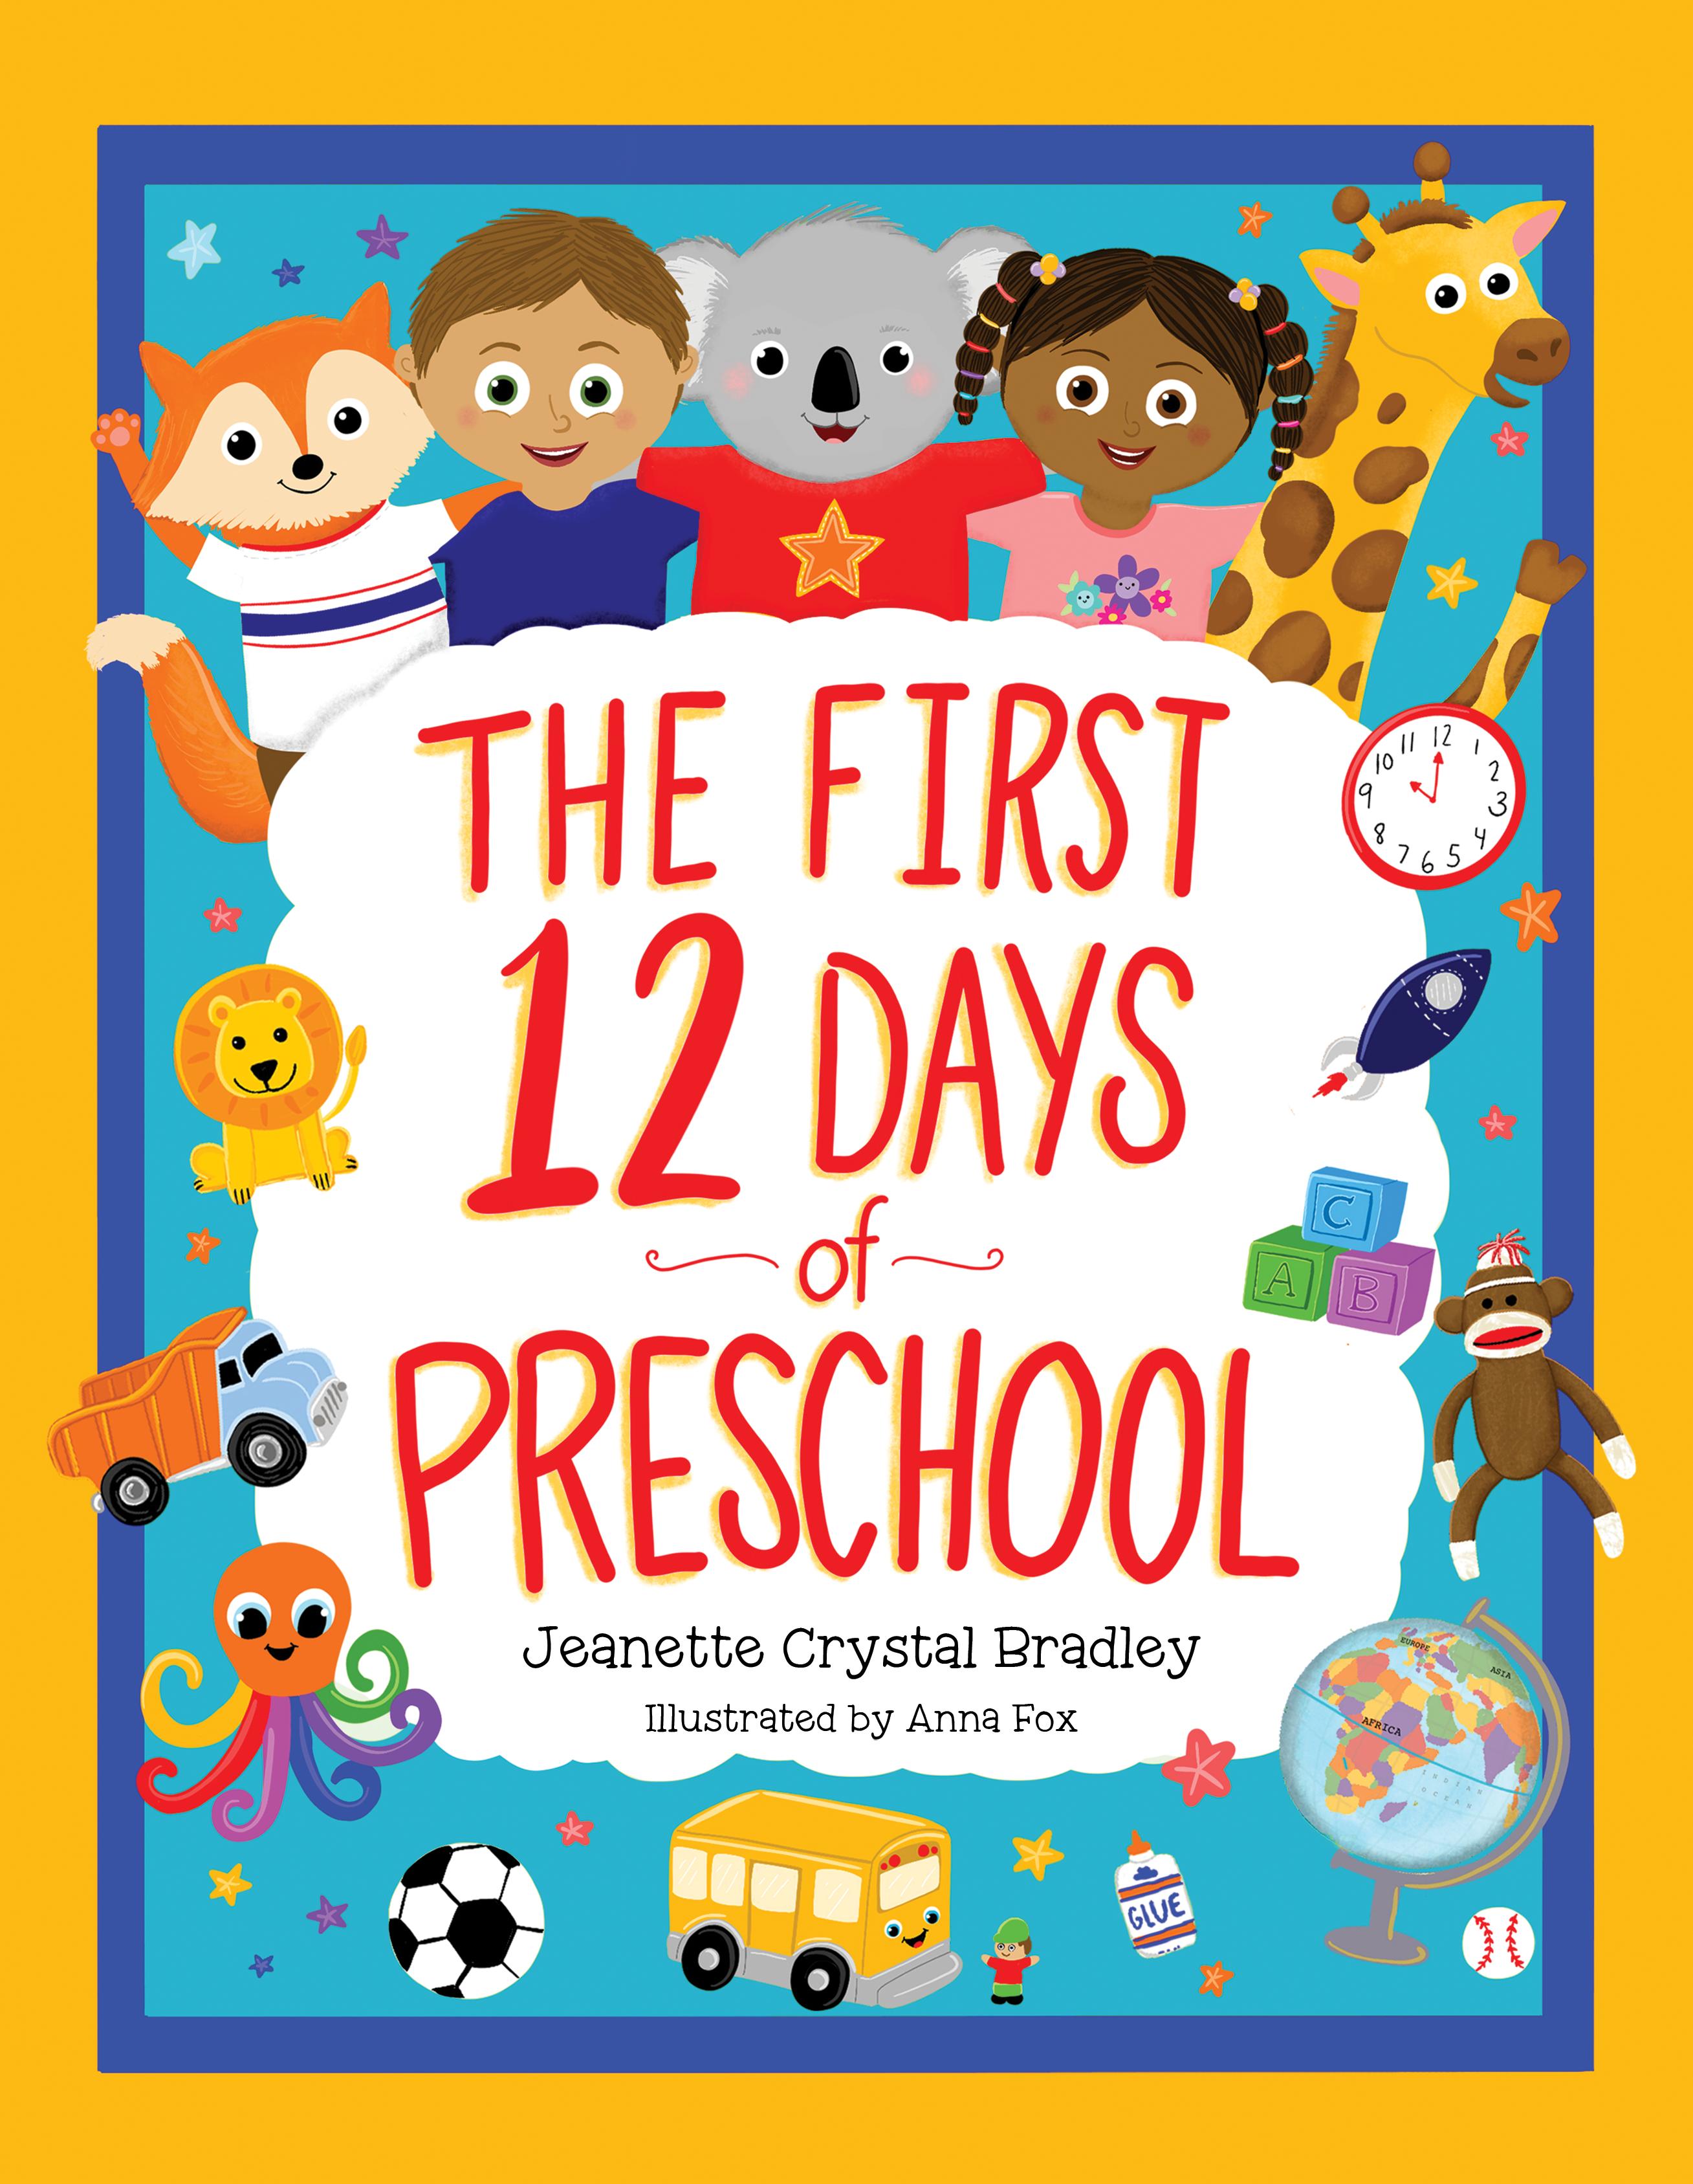 The First 12 Days of Preschool